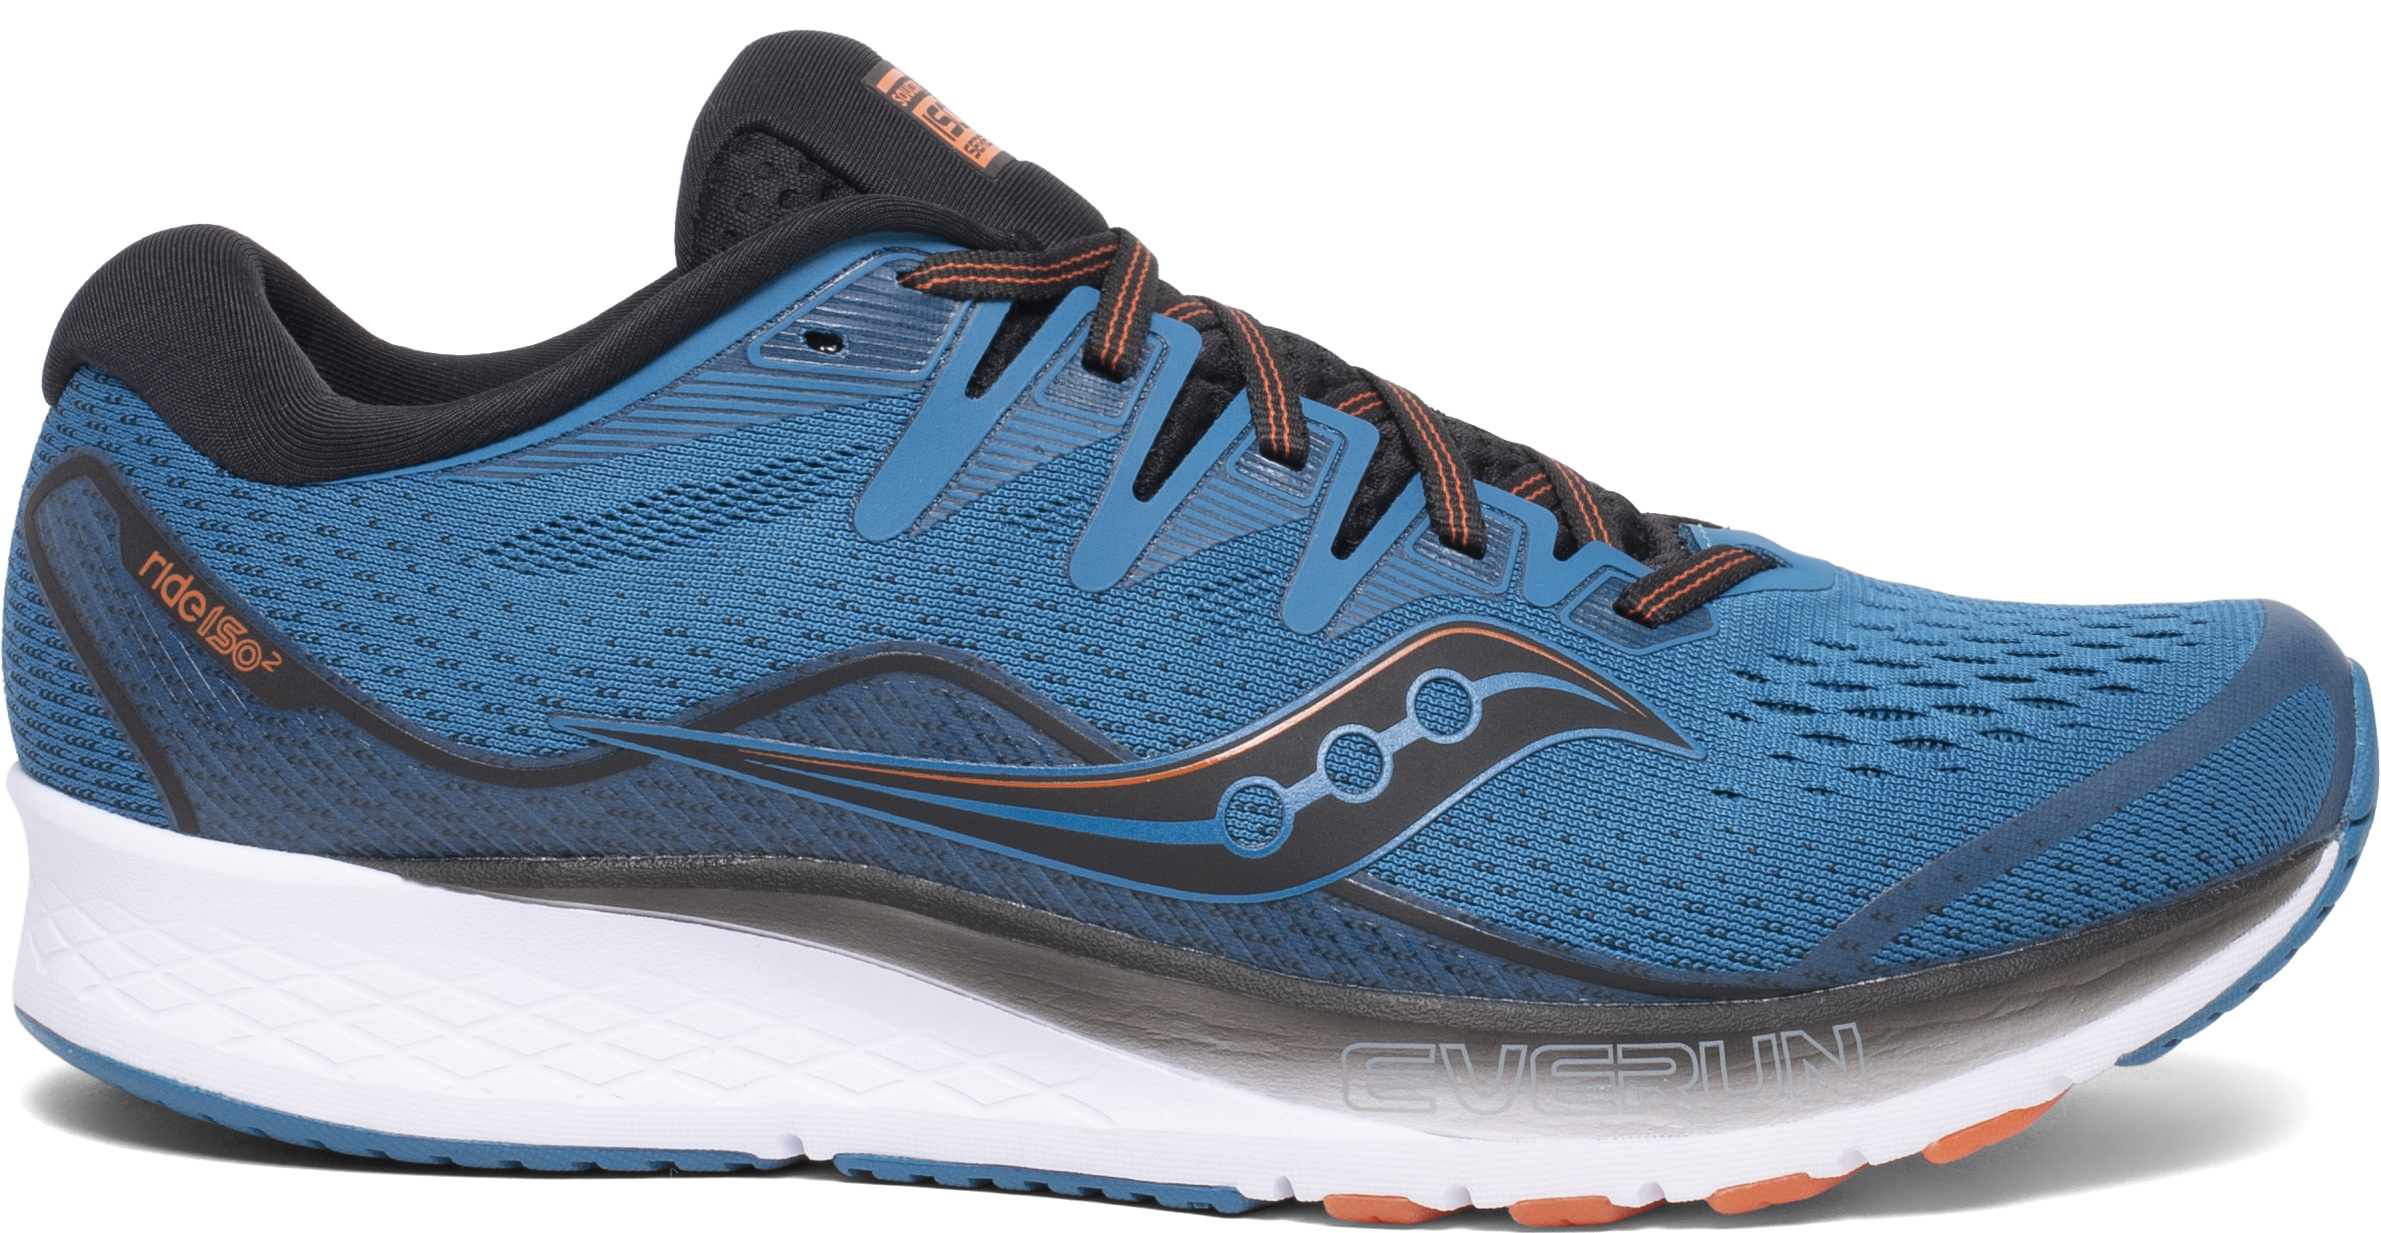 Saucony Ride Iso 2 - Running shoes - Men's